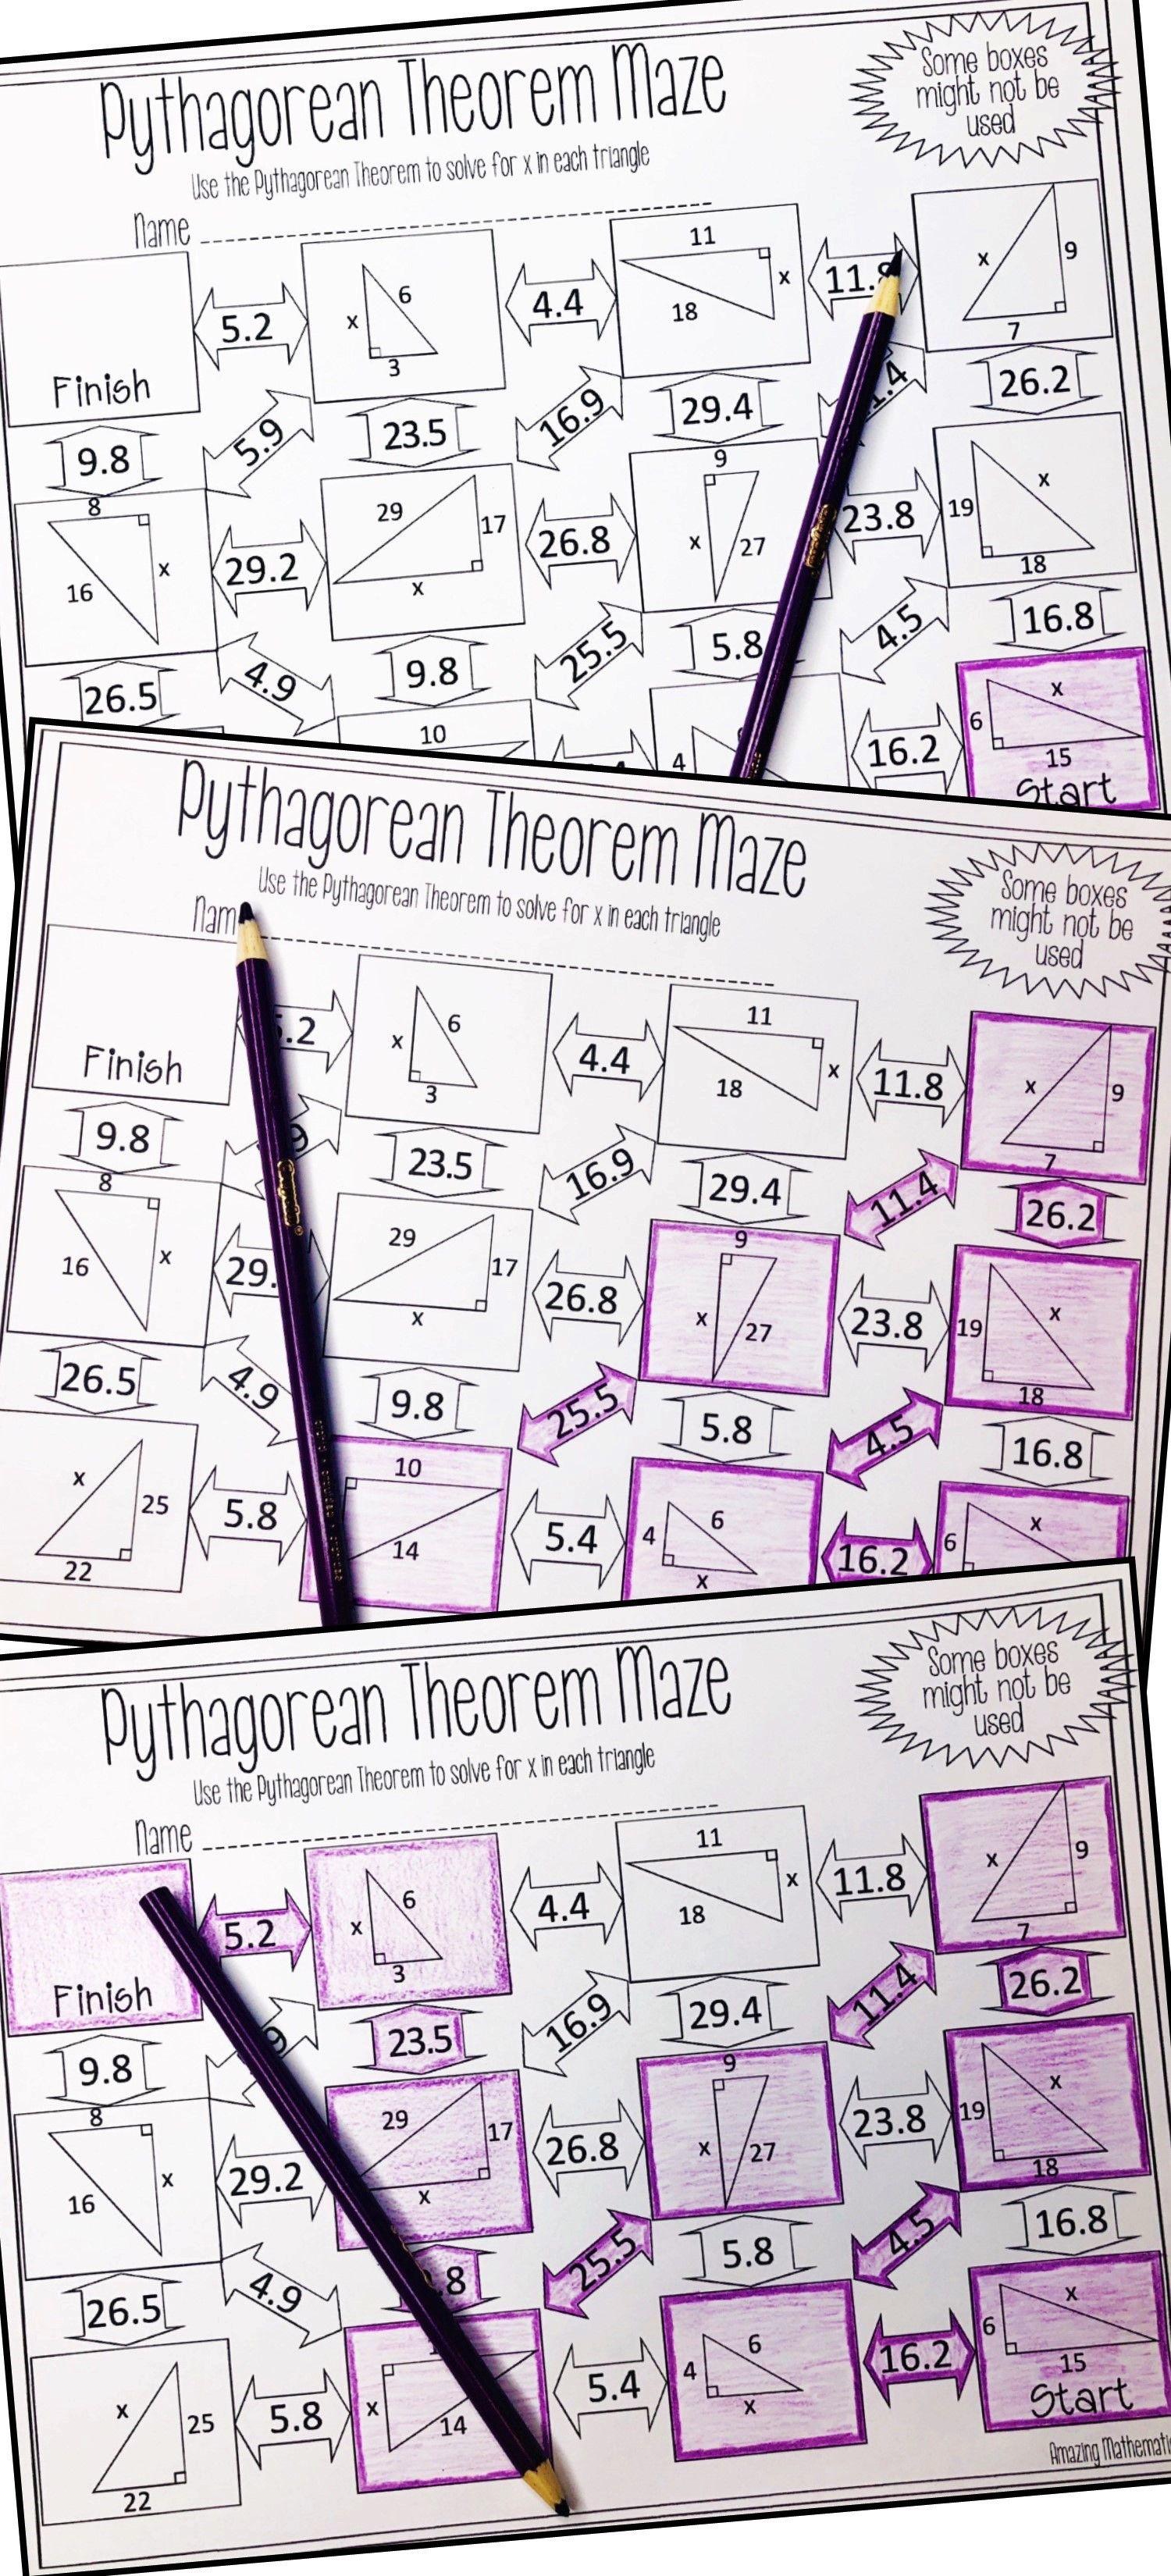 Pythagorean Theorem Maze Worksheet Pythagorean theorem